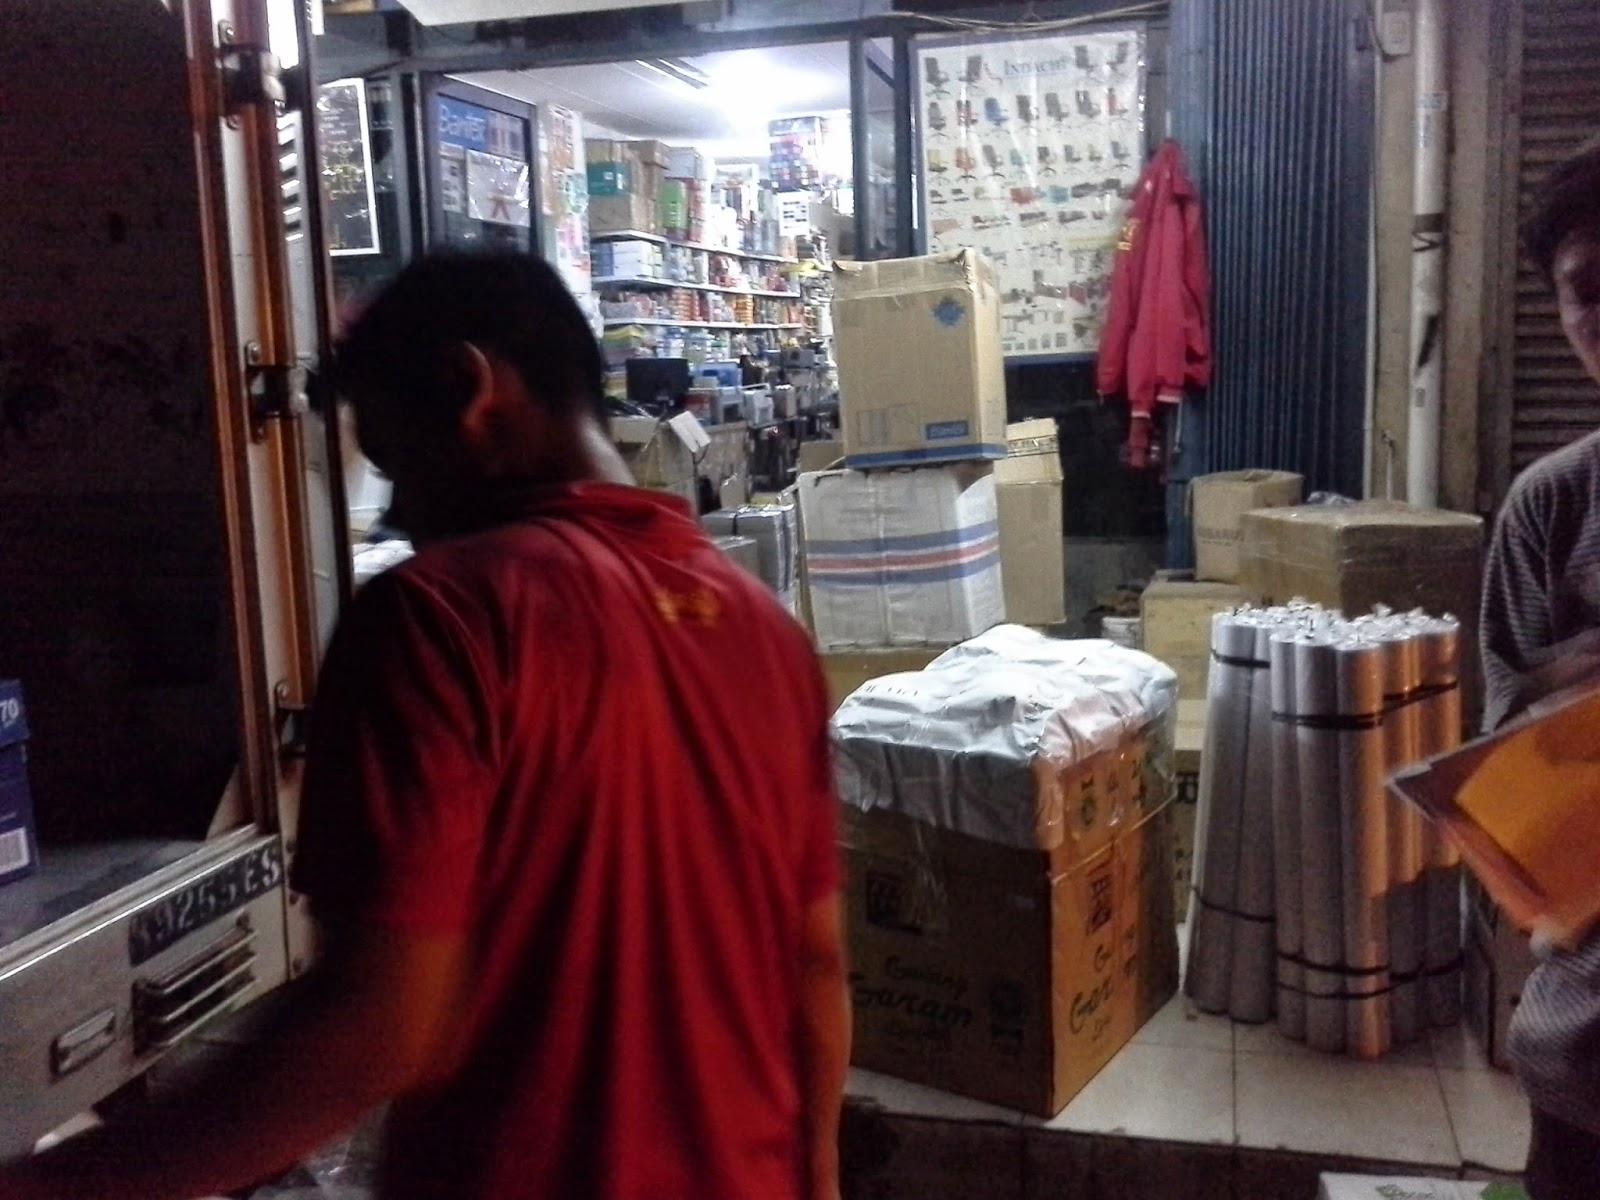 Agen Stationery se JAKARTA BOGOR DEPOK TANGERANG BEKASI sedia Daftar Harga ATK 2015